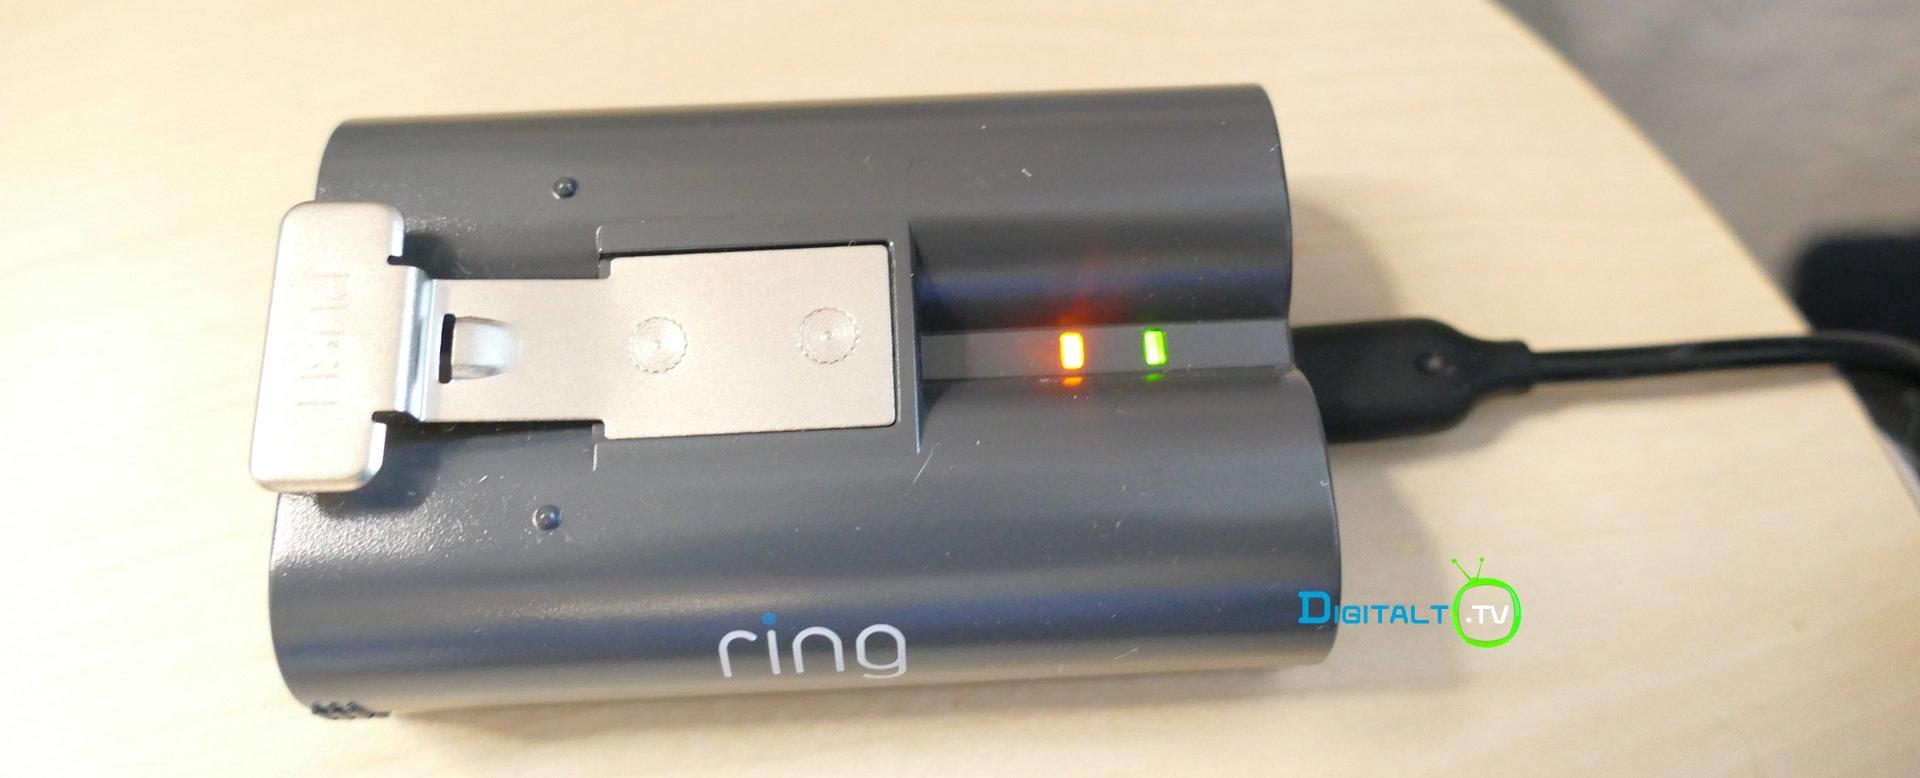 Ring battery